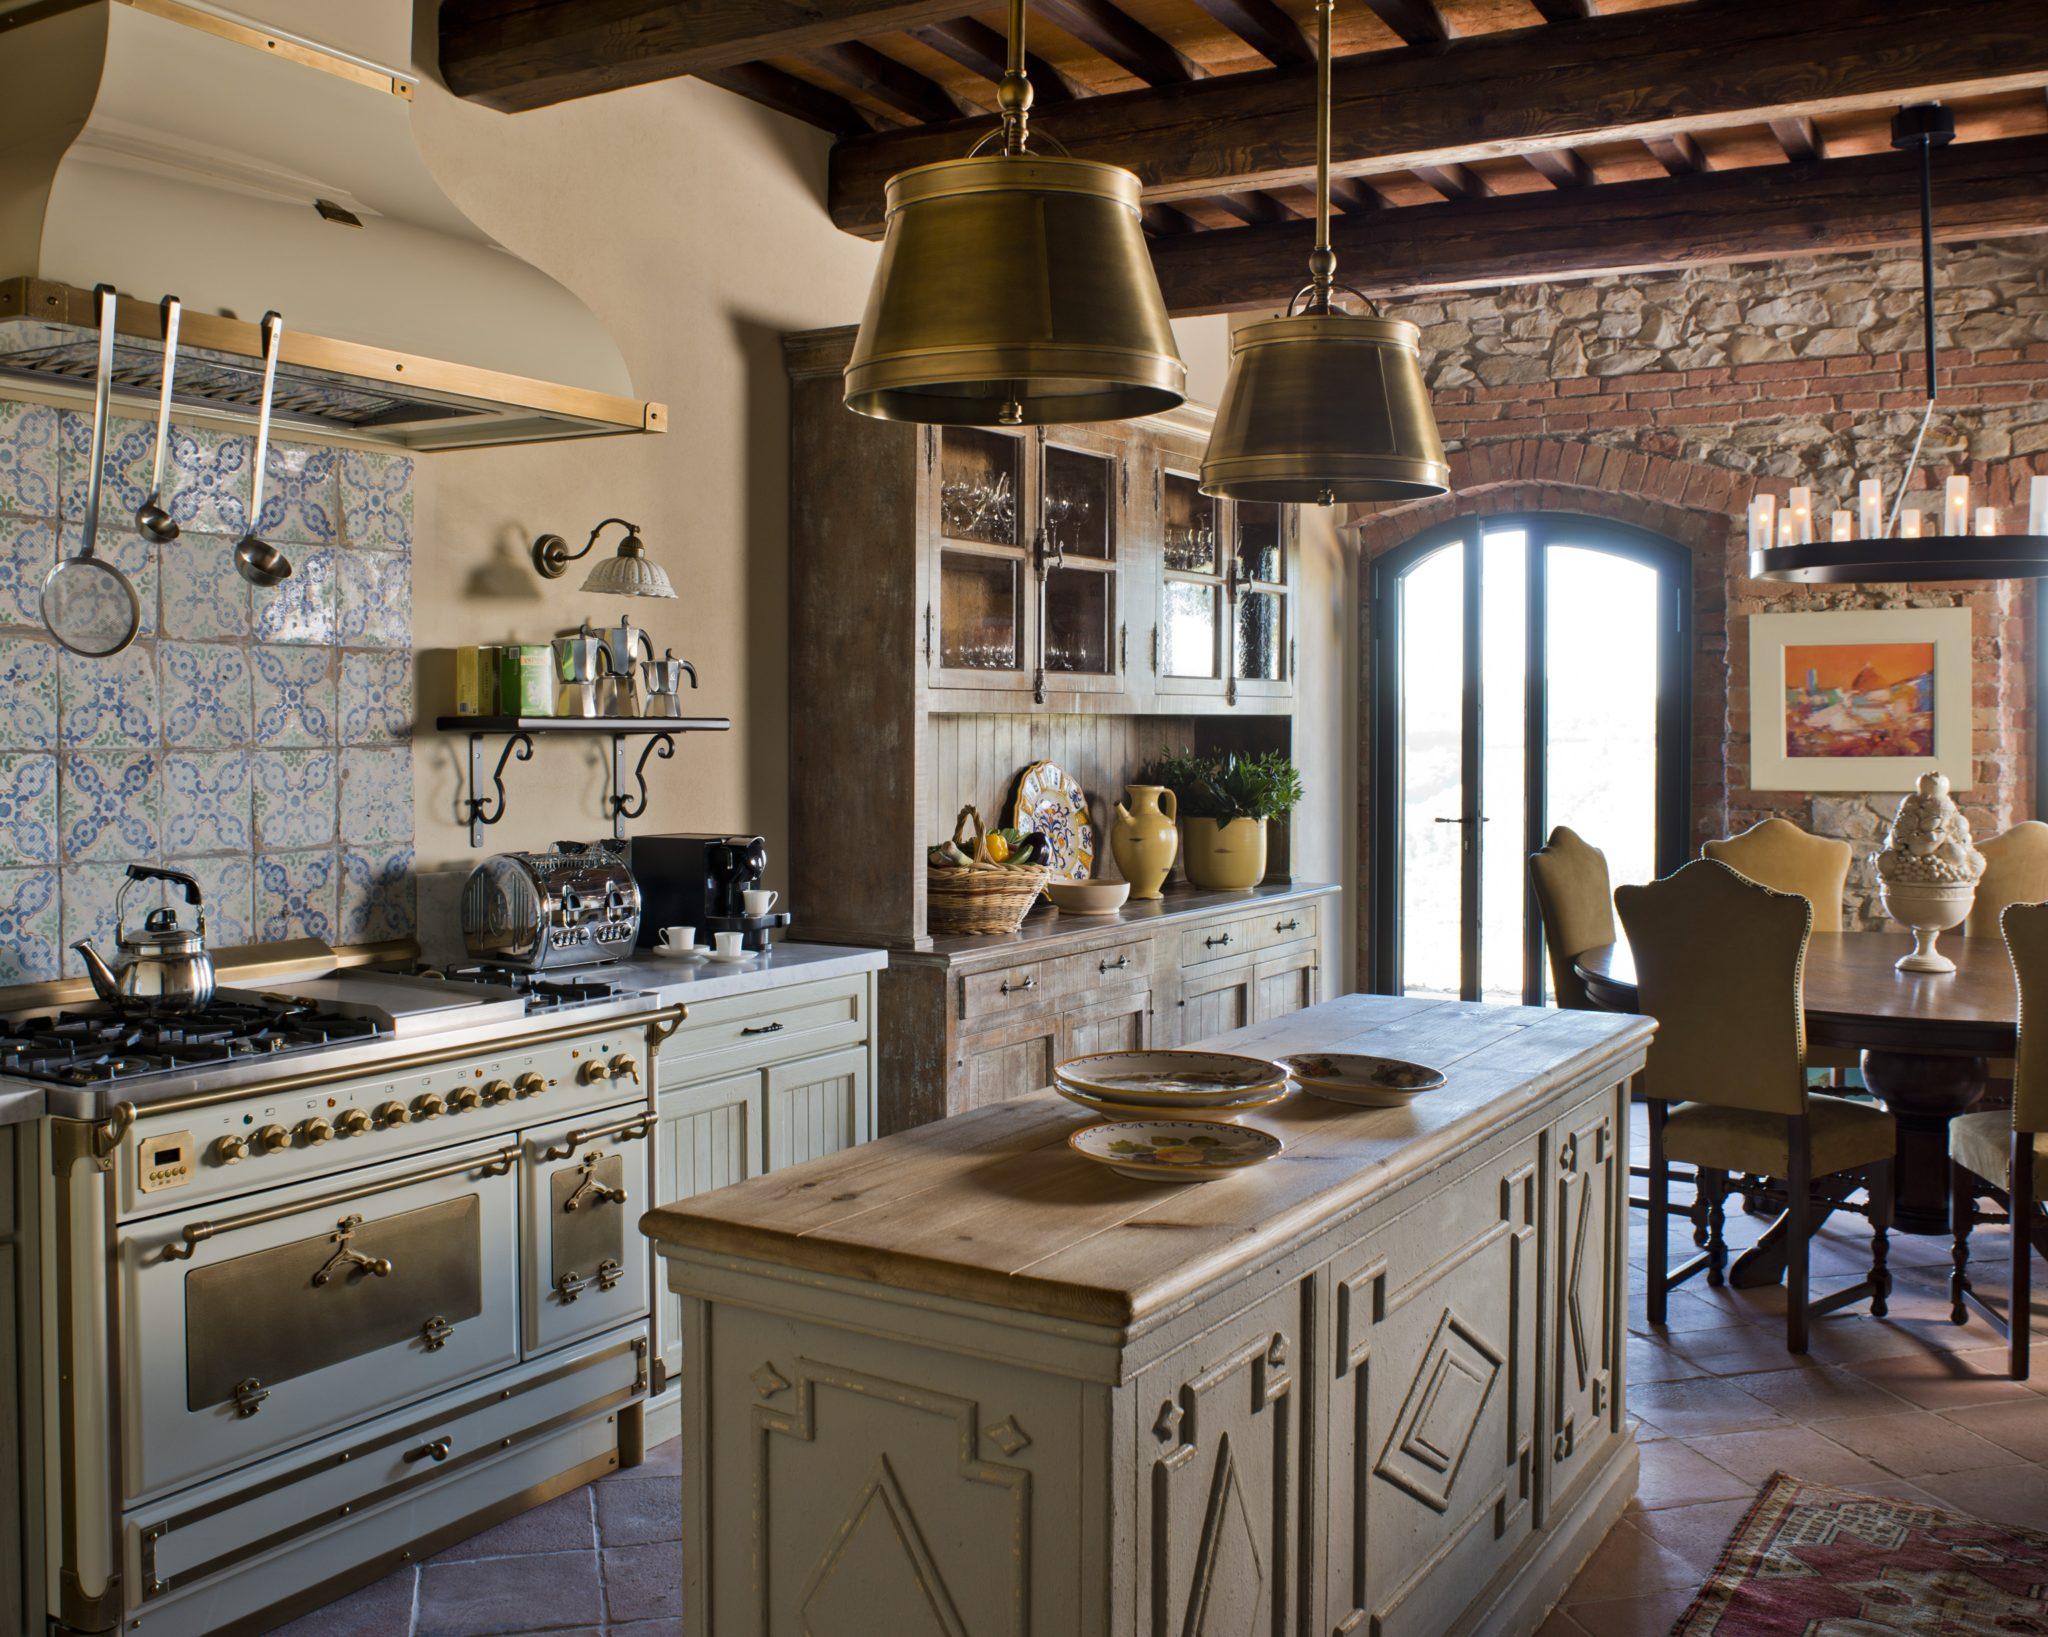 Italian Farmhouse Kitchen in Tuscany by J Banks Design